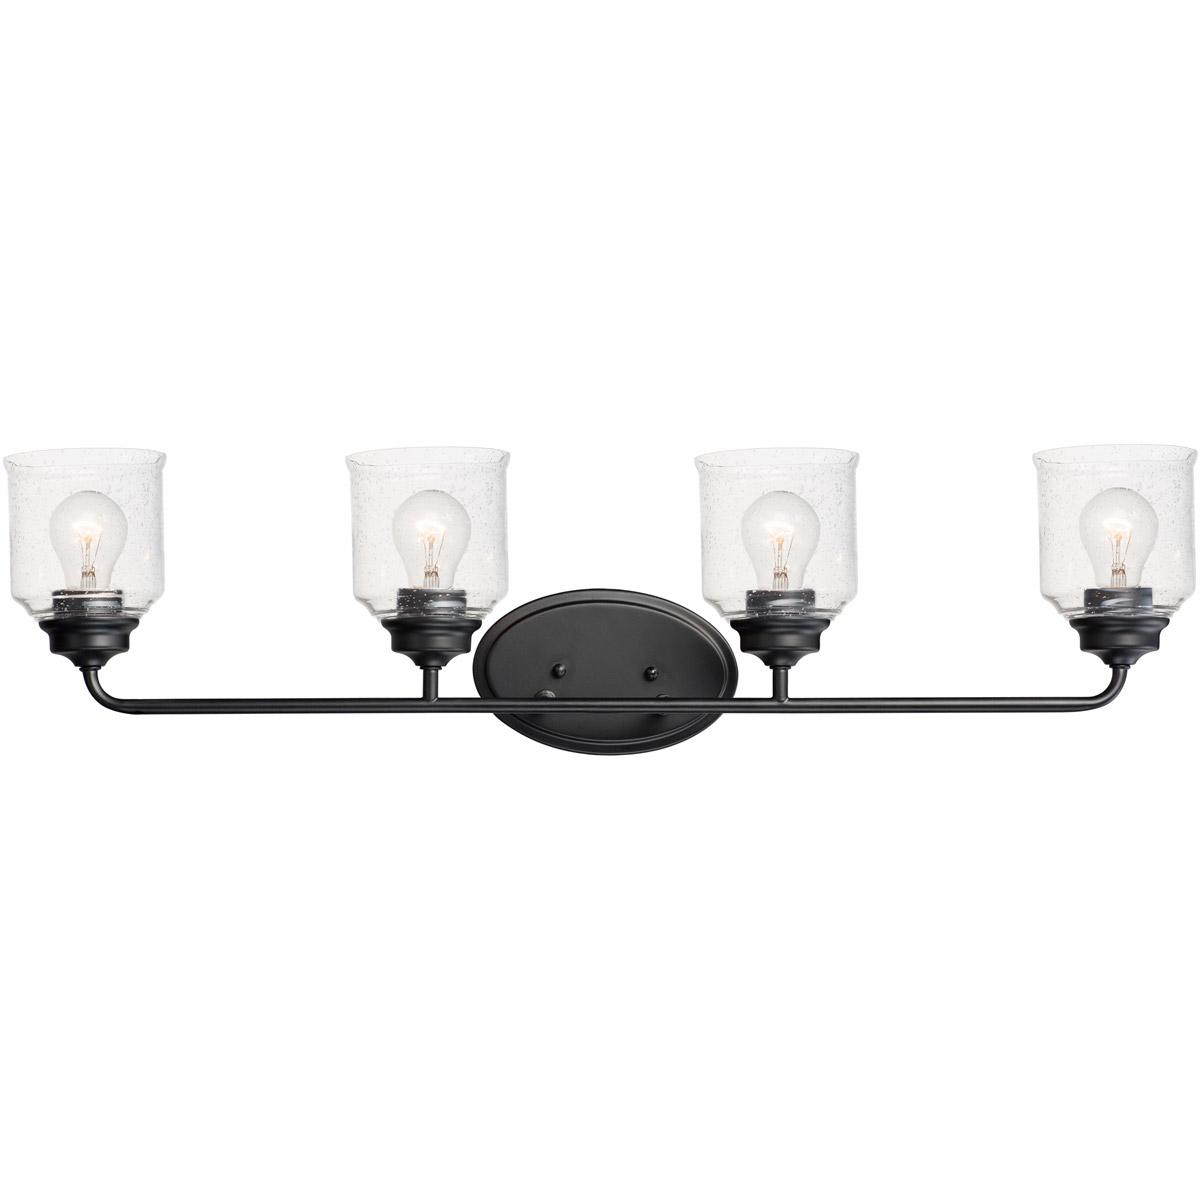 Details About Maxim Lighting 12264cdbk Acadia 4 Light 35 Inch Black Vanity Wall